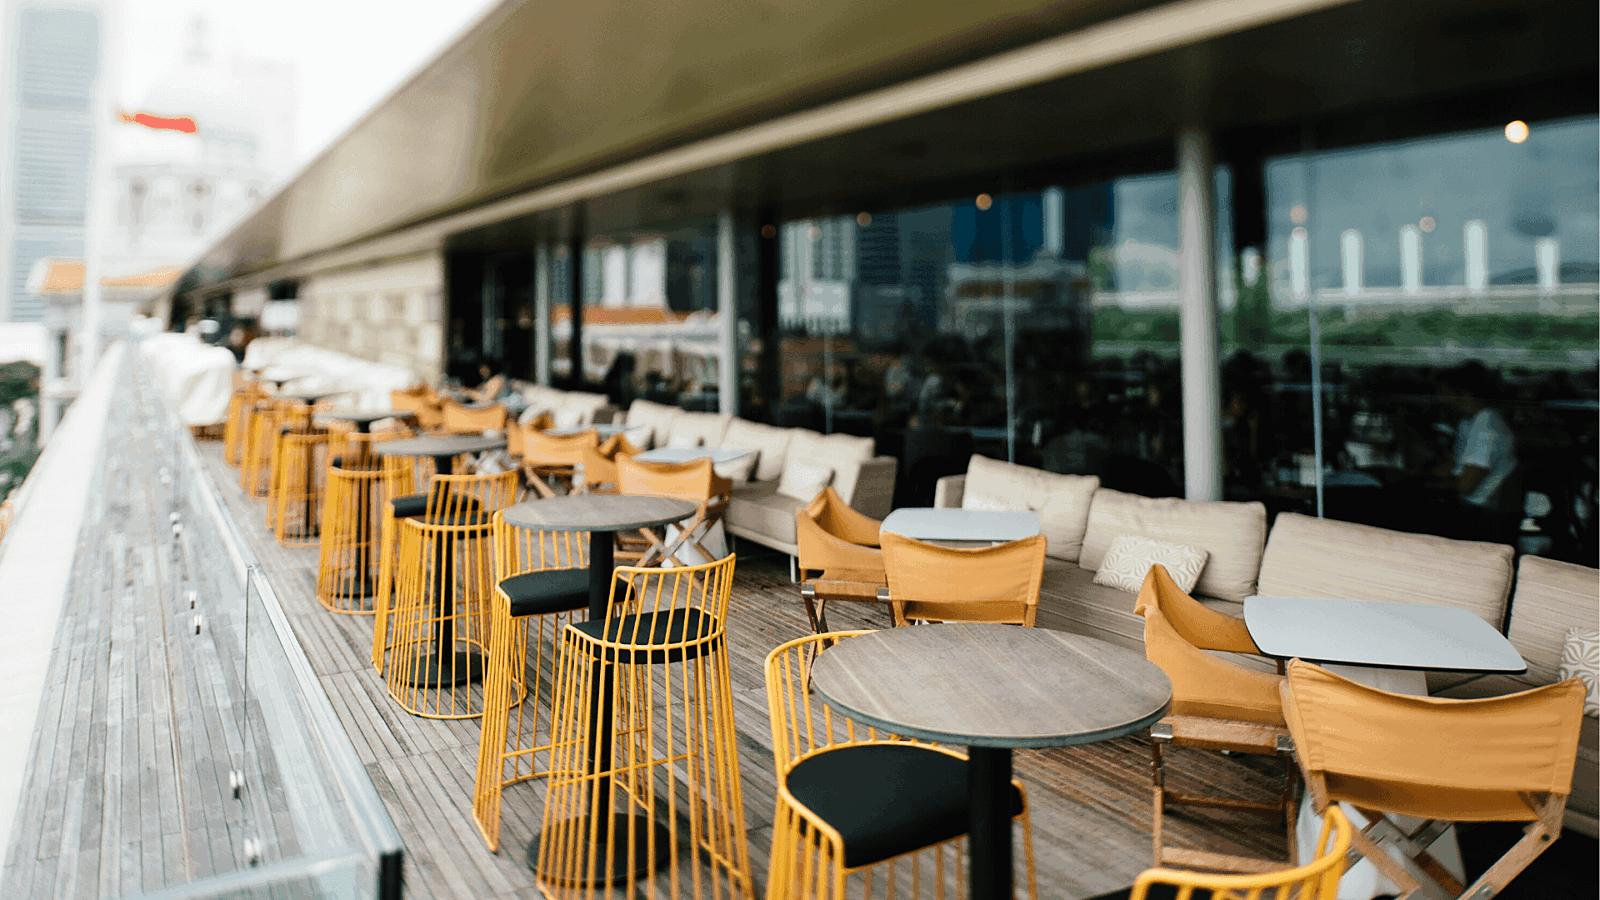 Restaurant Seating Strategy Hero Image 1